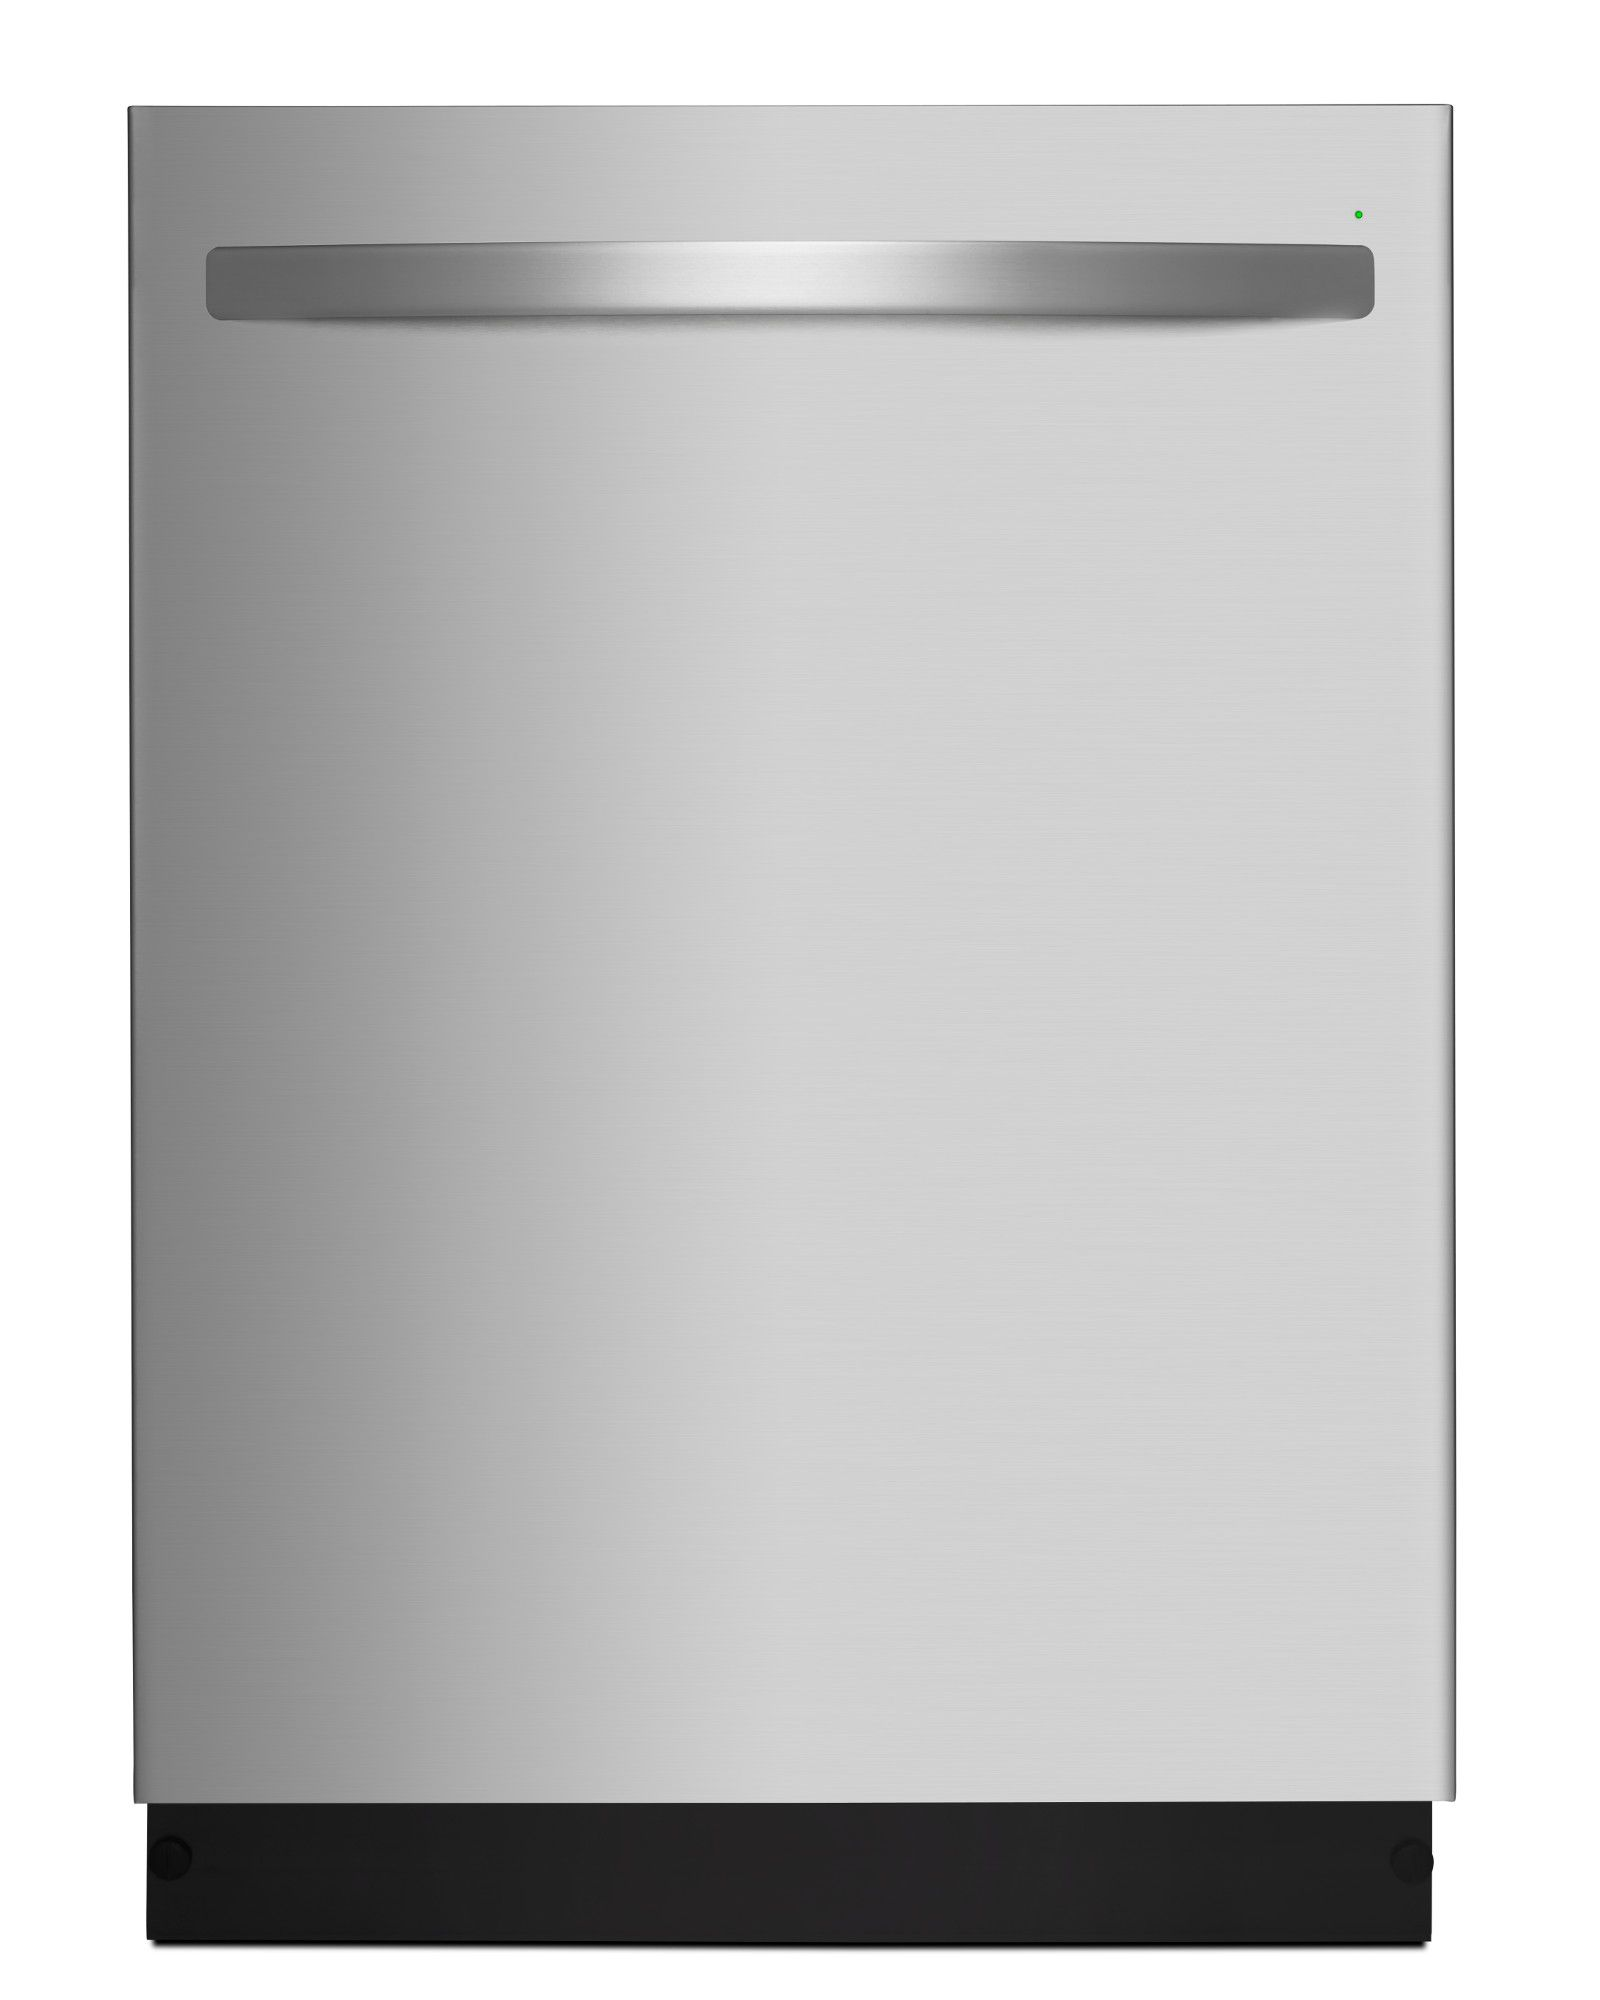 Kenmore Elite Dishwasher Door Spring And Cable Kit Ebay